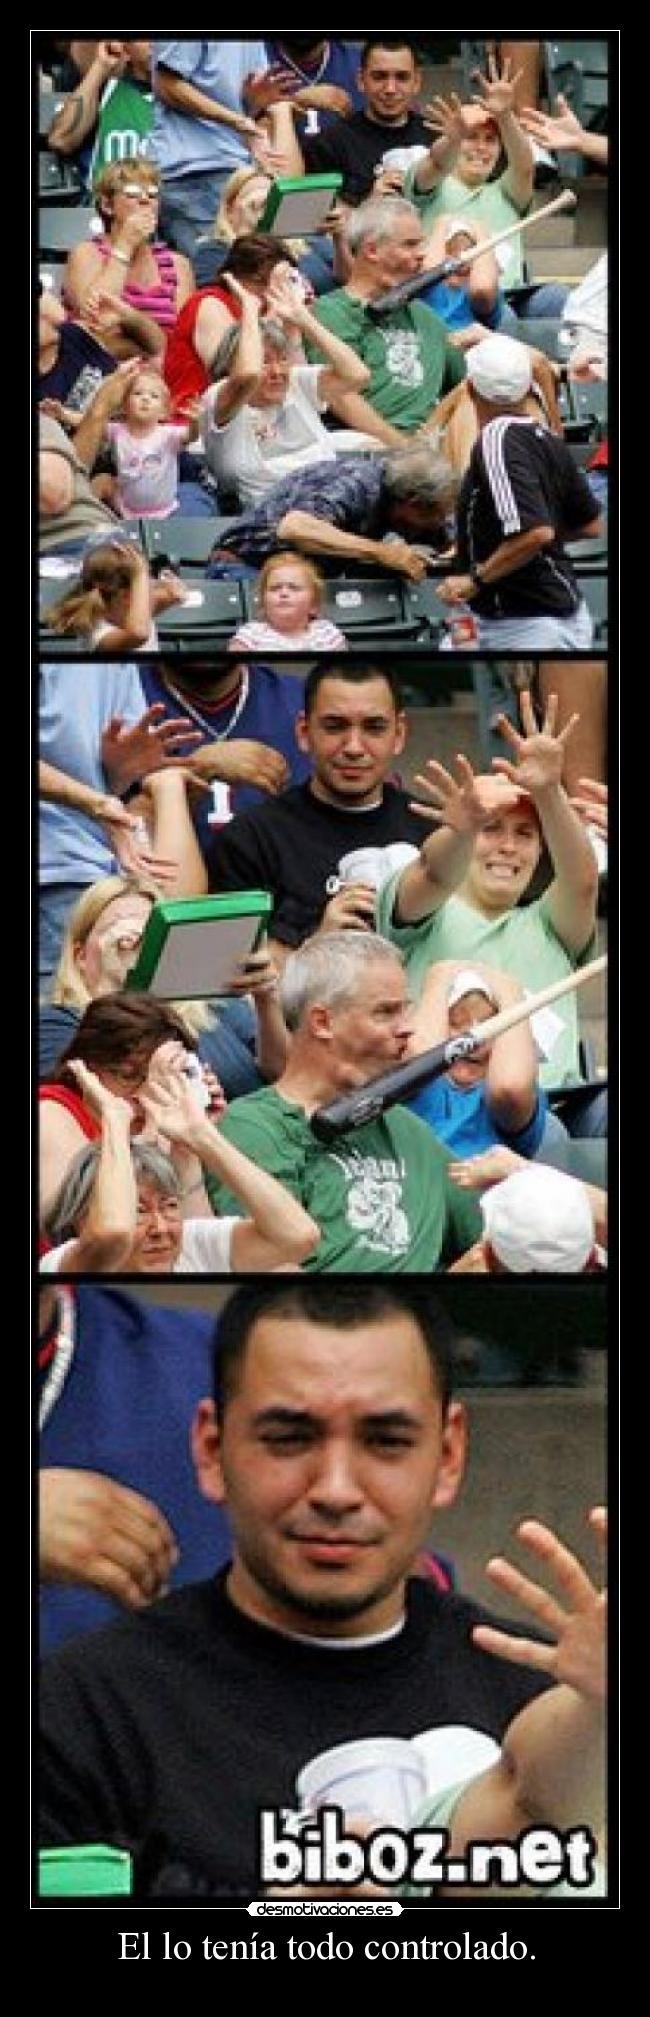 carteles baseball desmotivaciones